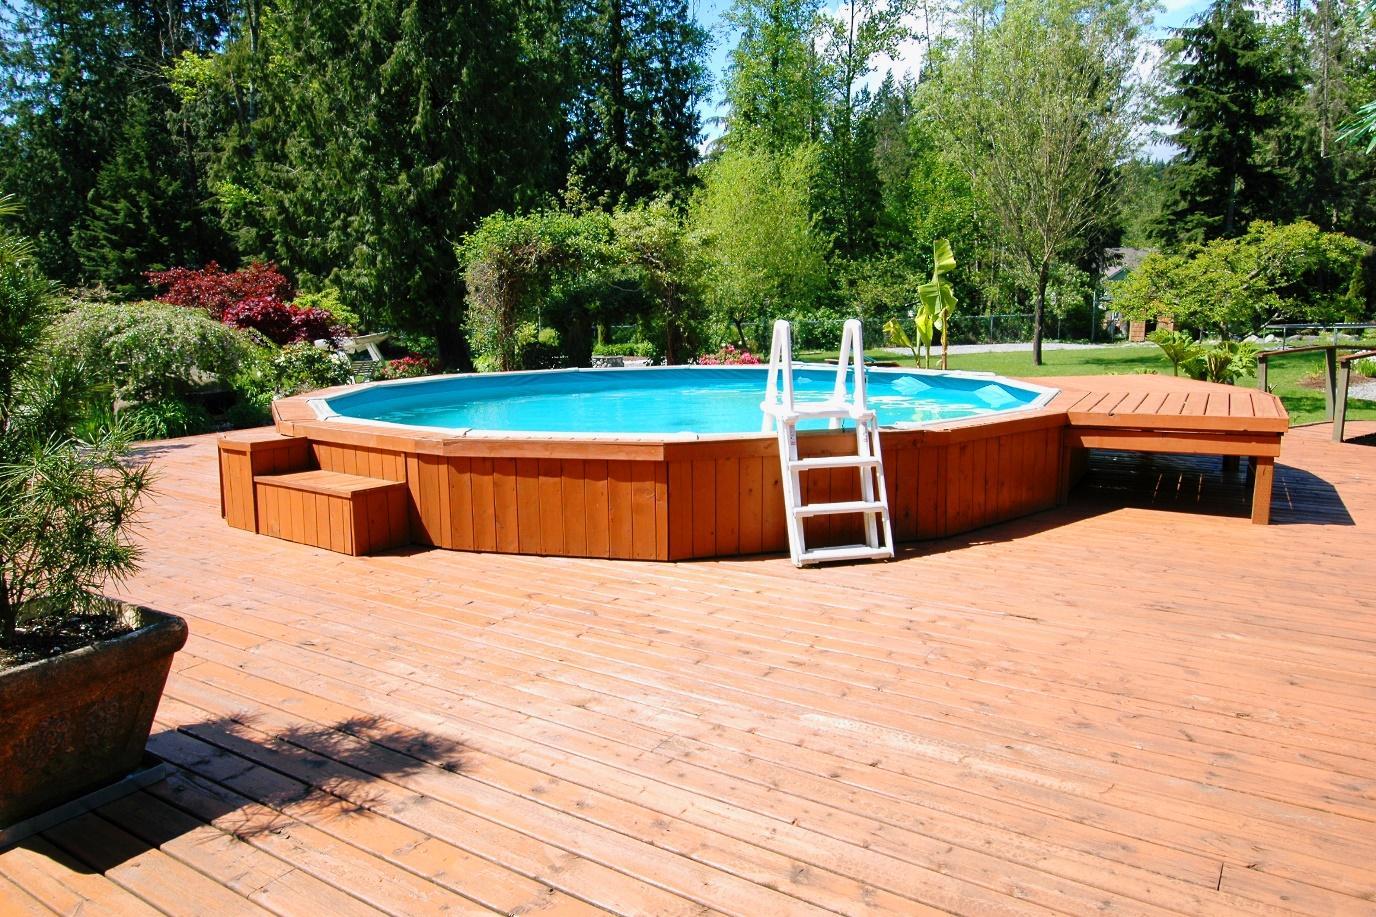 Pool built on top of decking